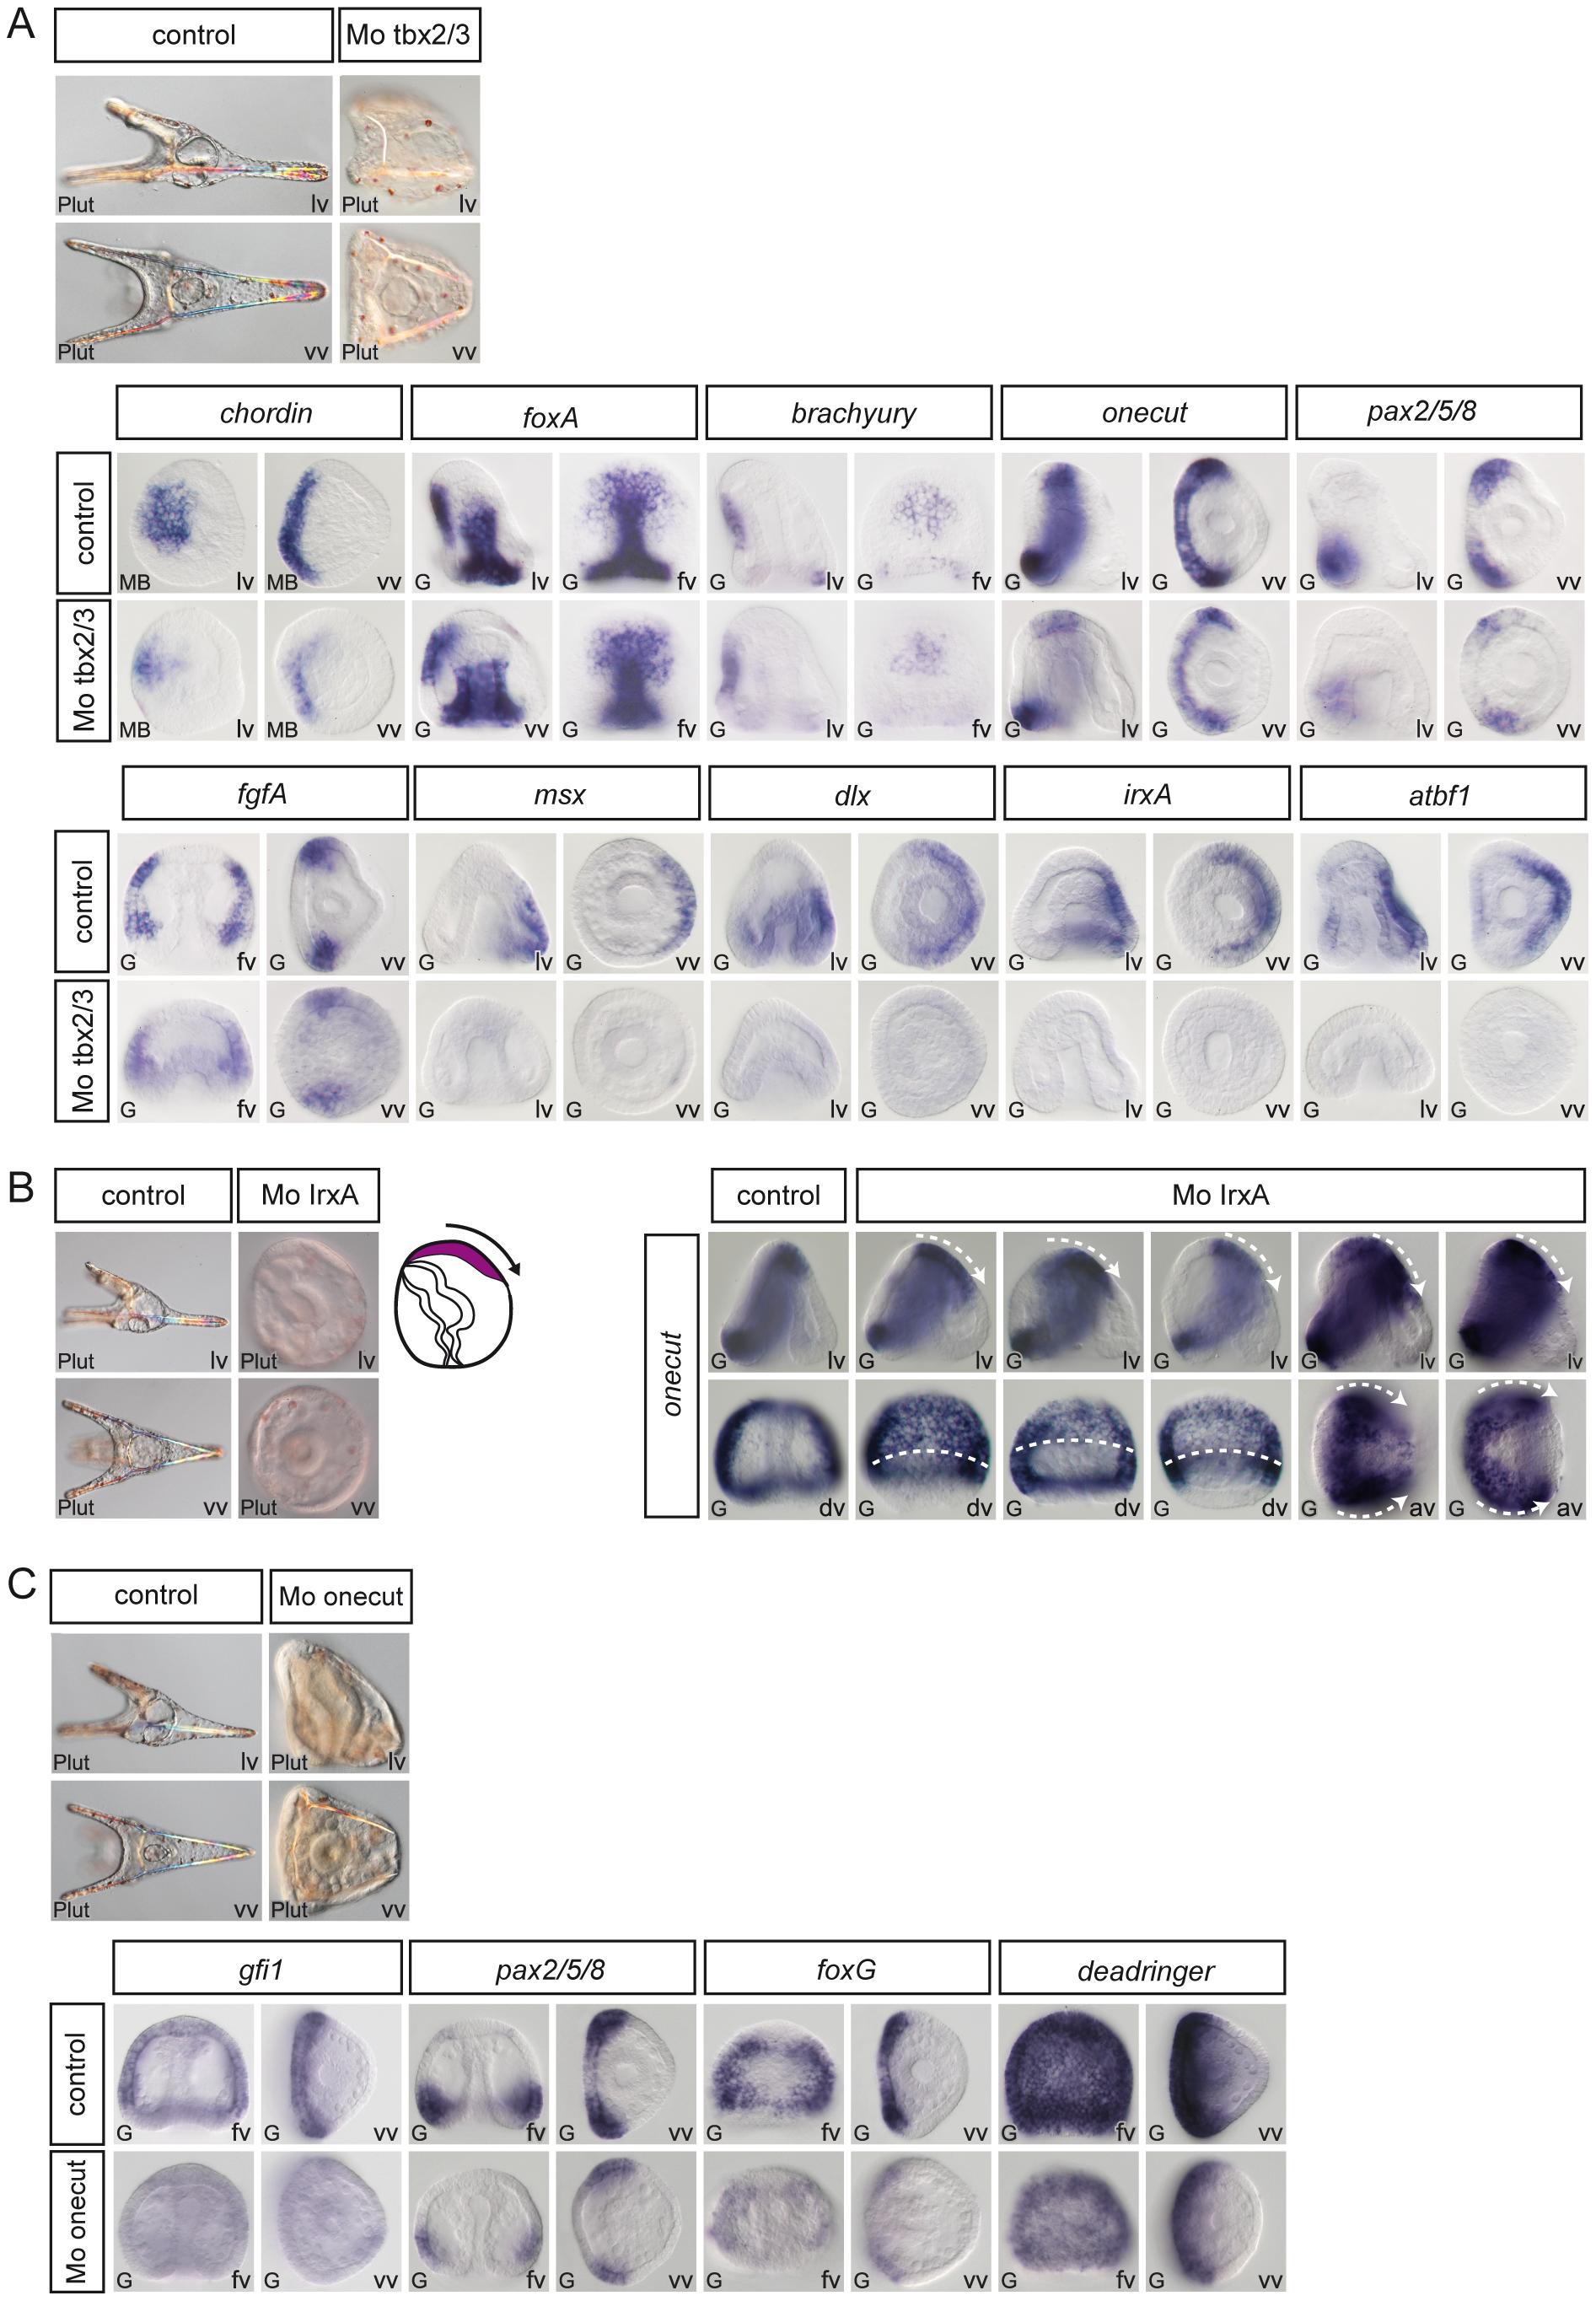 Epistasis analysis of dorsal genes: <i>irxA</i> as a repressor of ciliary band gene expression downstream of <i>tbx2/3</i>.